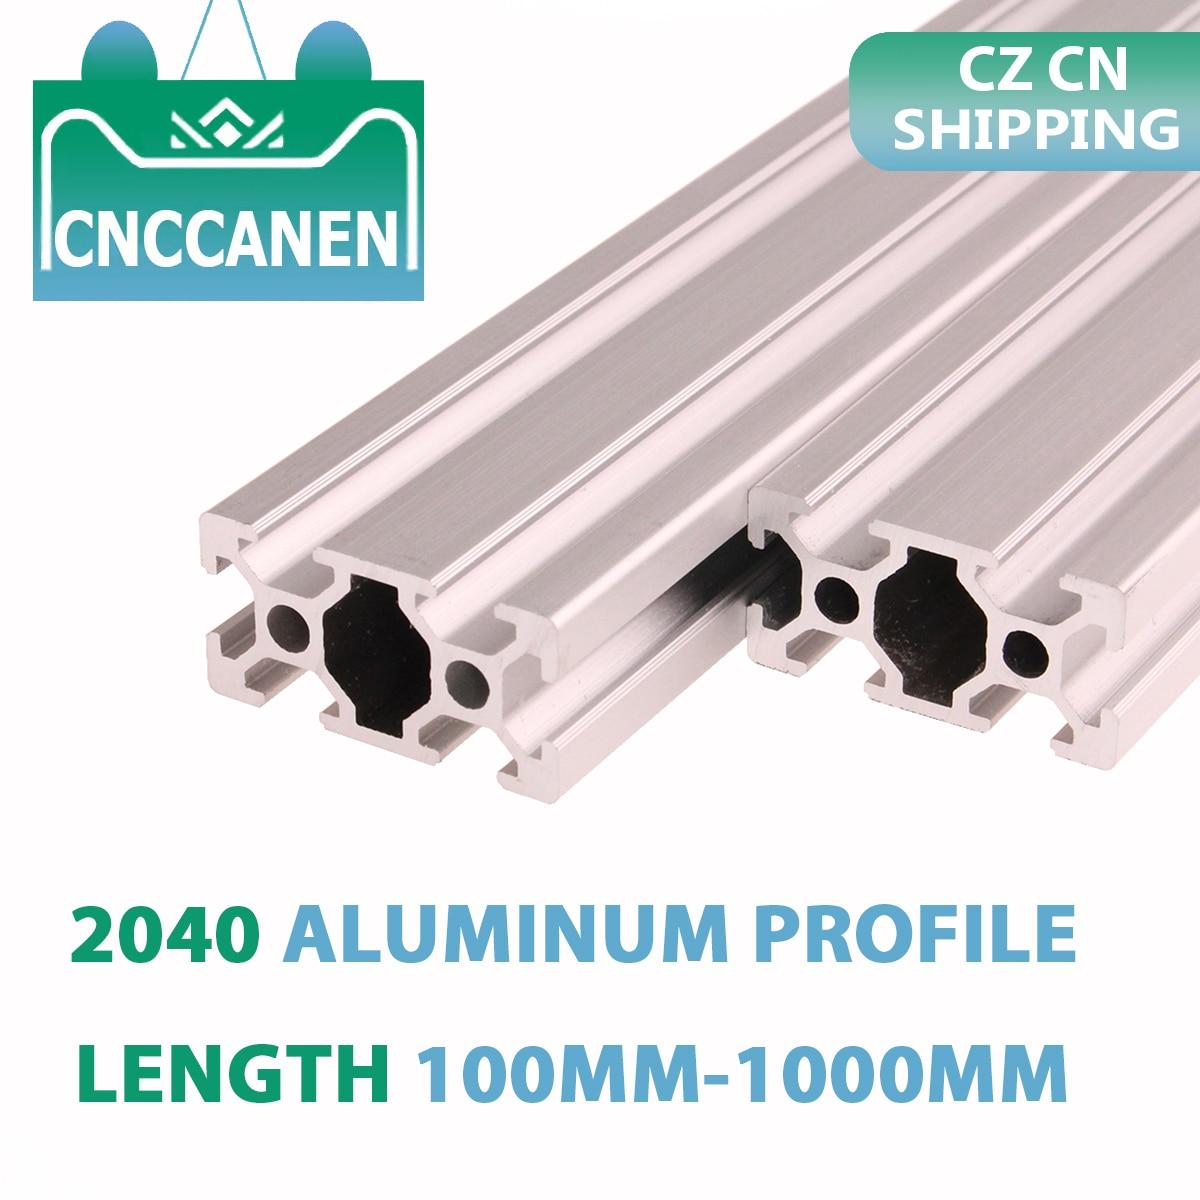 CZ CN Shipping 2PCS 2040 Aluminum Extrusion Profile 100mm-1000mm Length European Standard Anodized For CNC 3D Printer Parts DIY